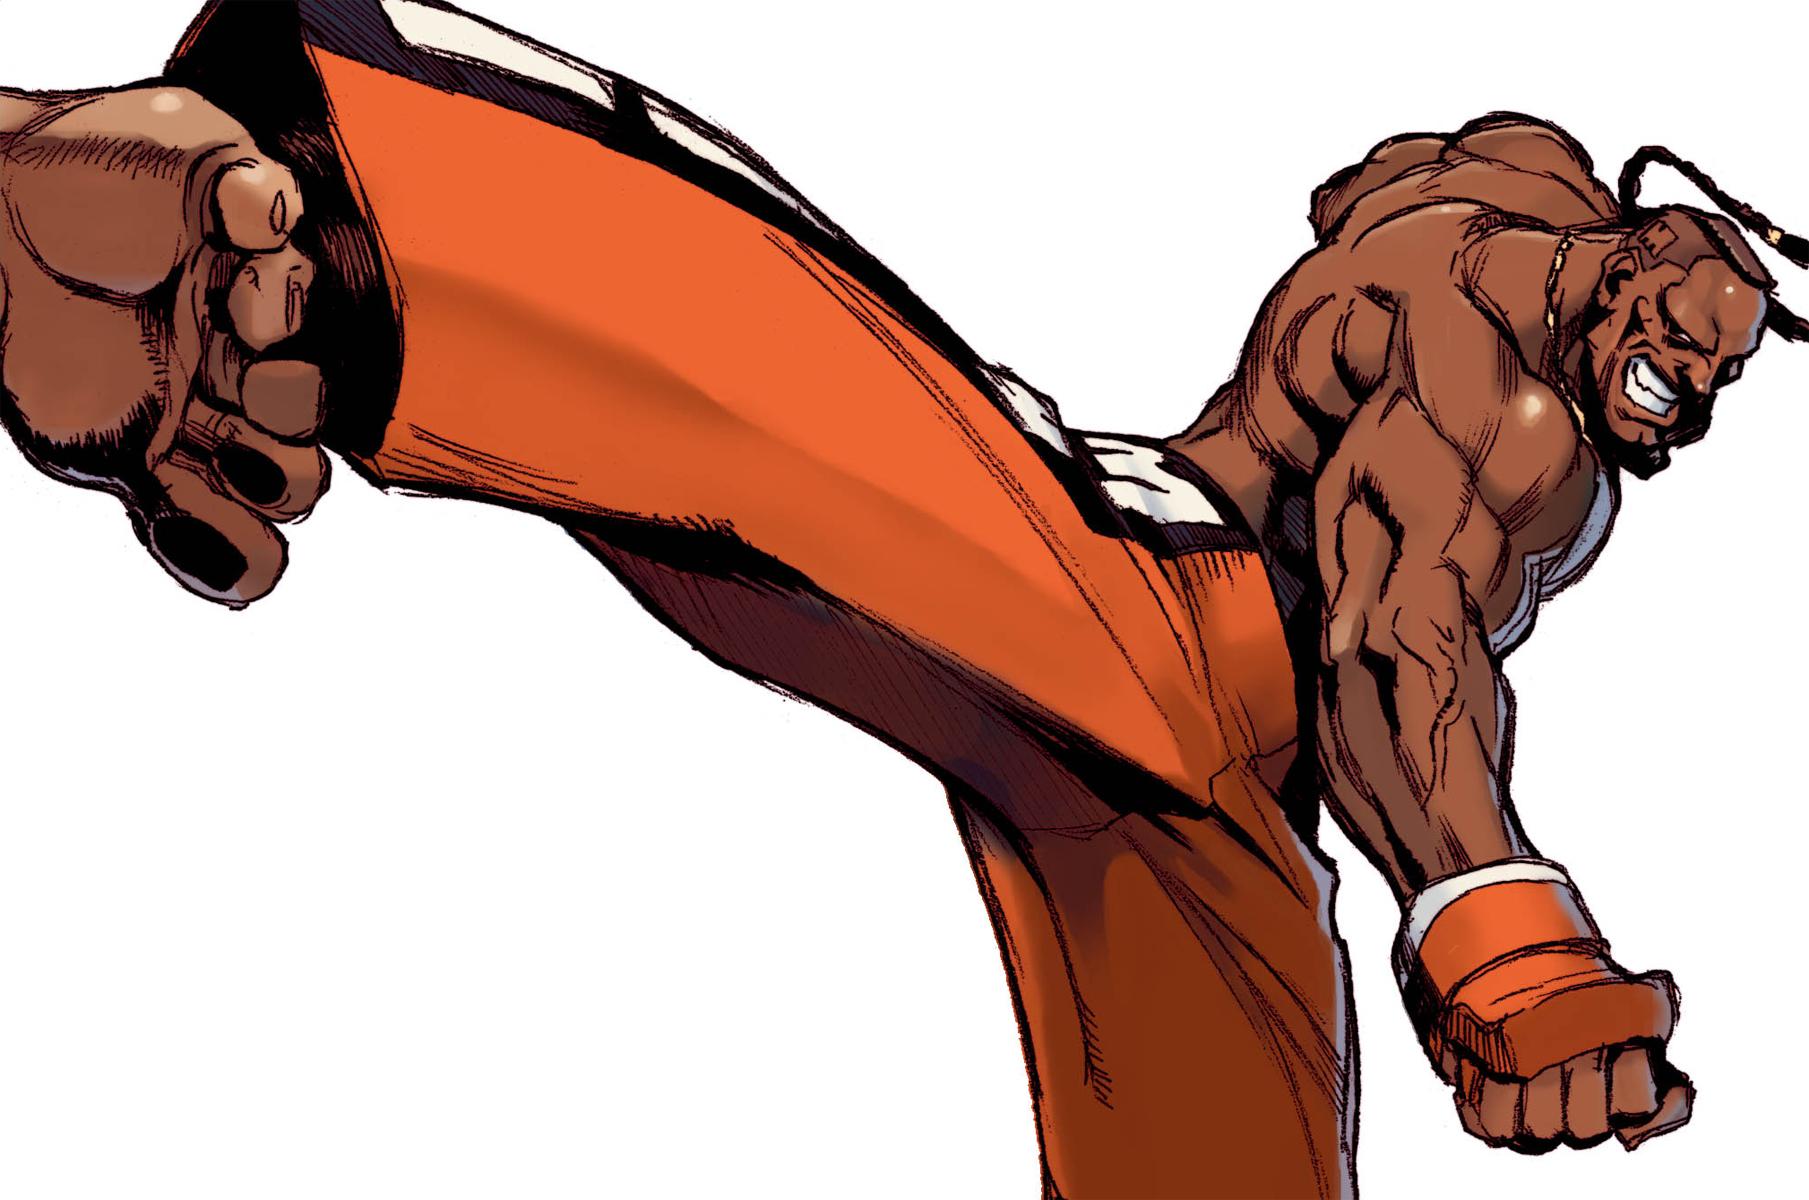 Super Street Fighter 2 Turbo  - Street Fighter Clipart